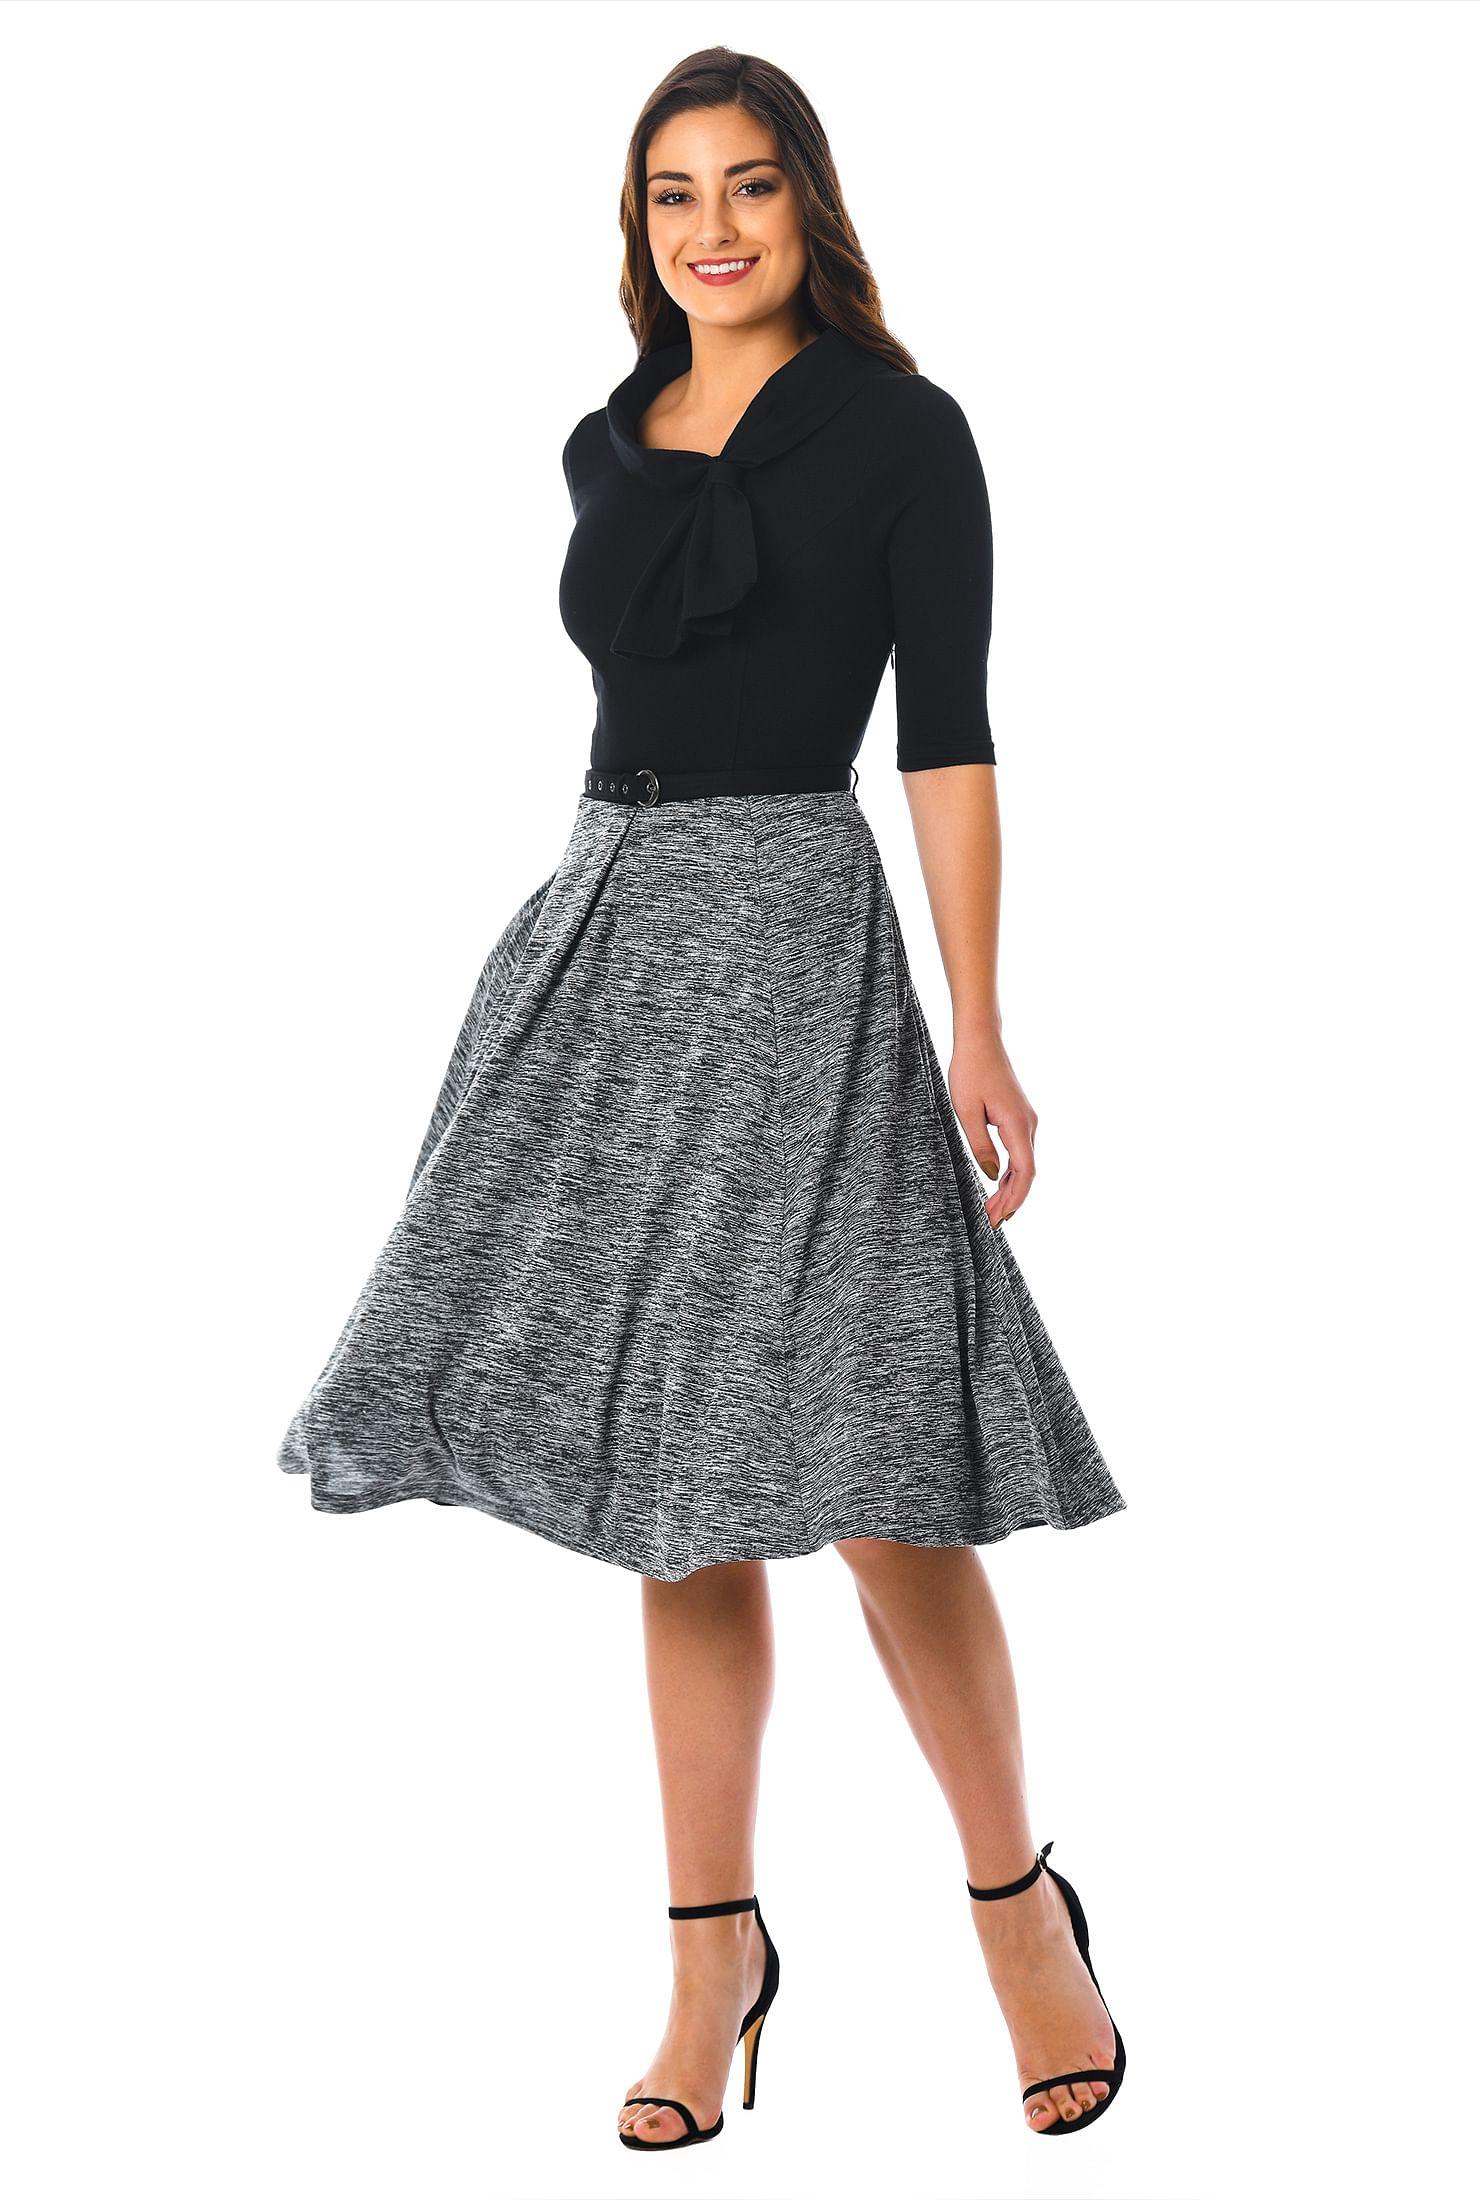 Fitted Dress Below Knee